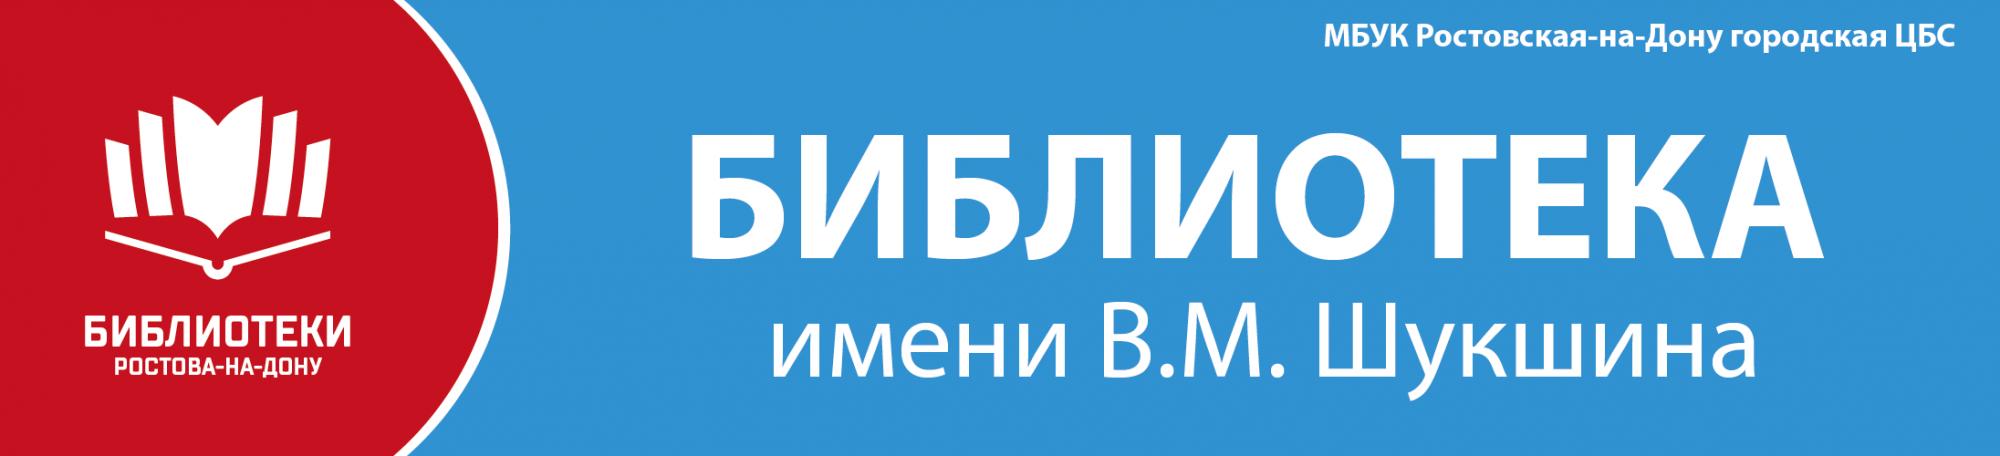 Библиотека имени В.М. Шукшина